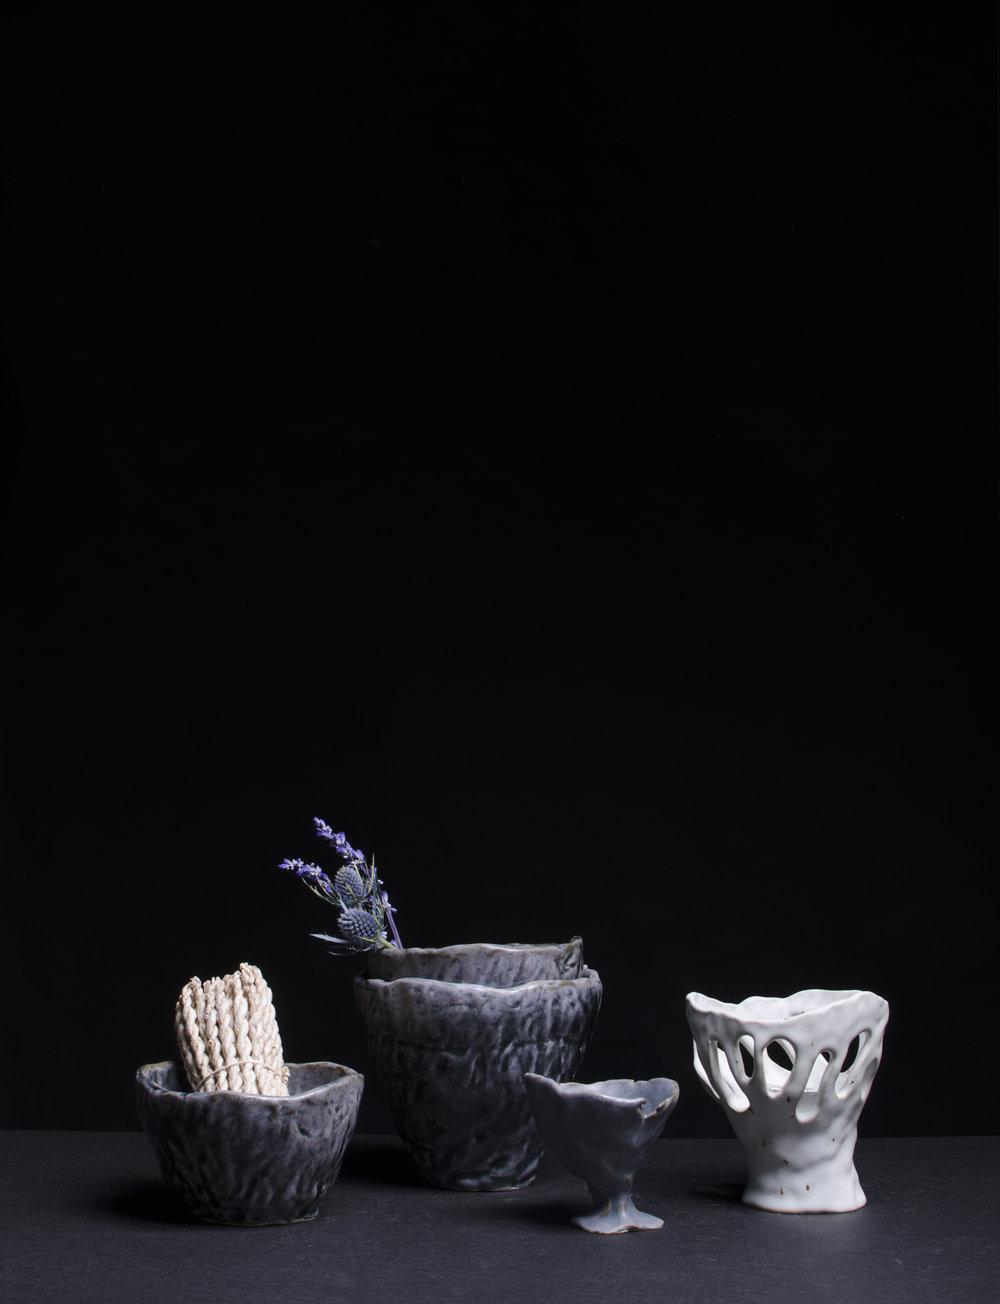 cauldrons chalice skull.jpg